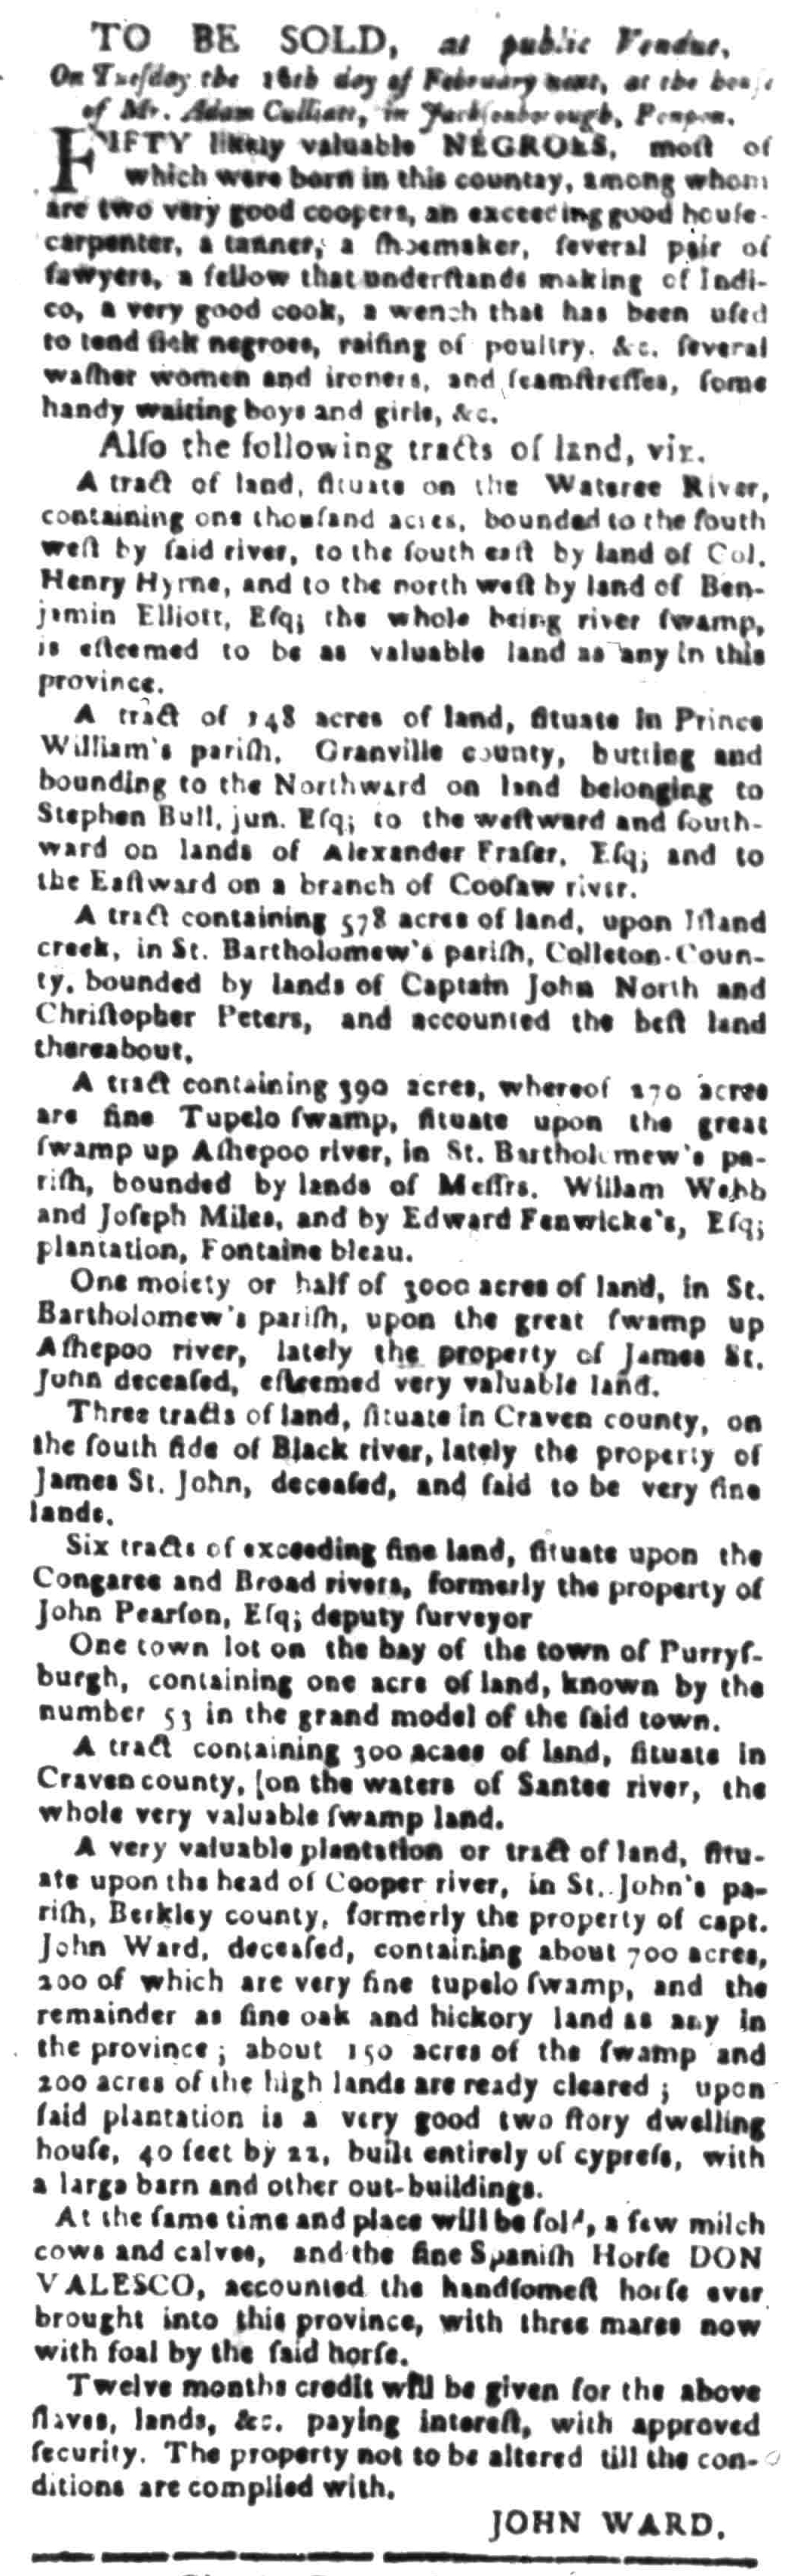 Feb 1 - South Carolina Gazette Slavery 4